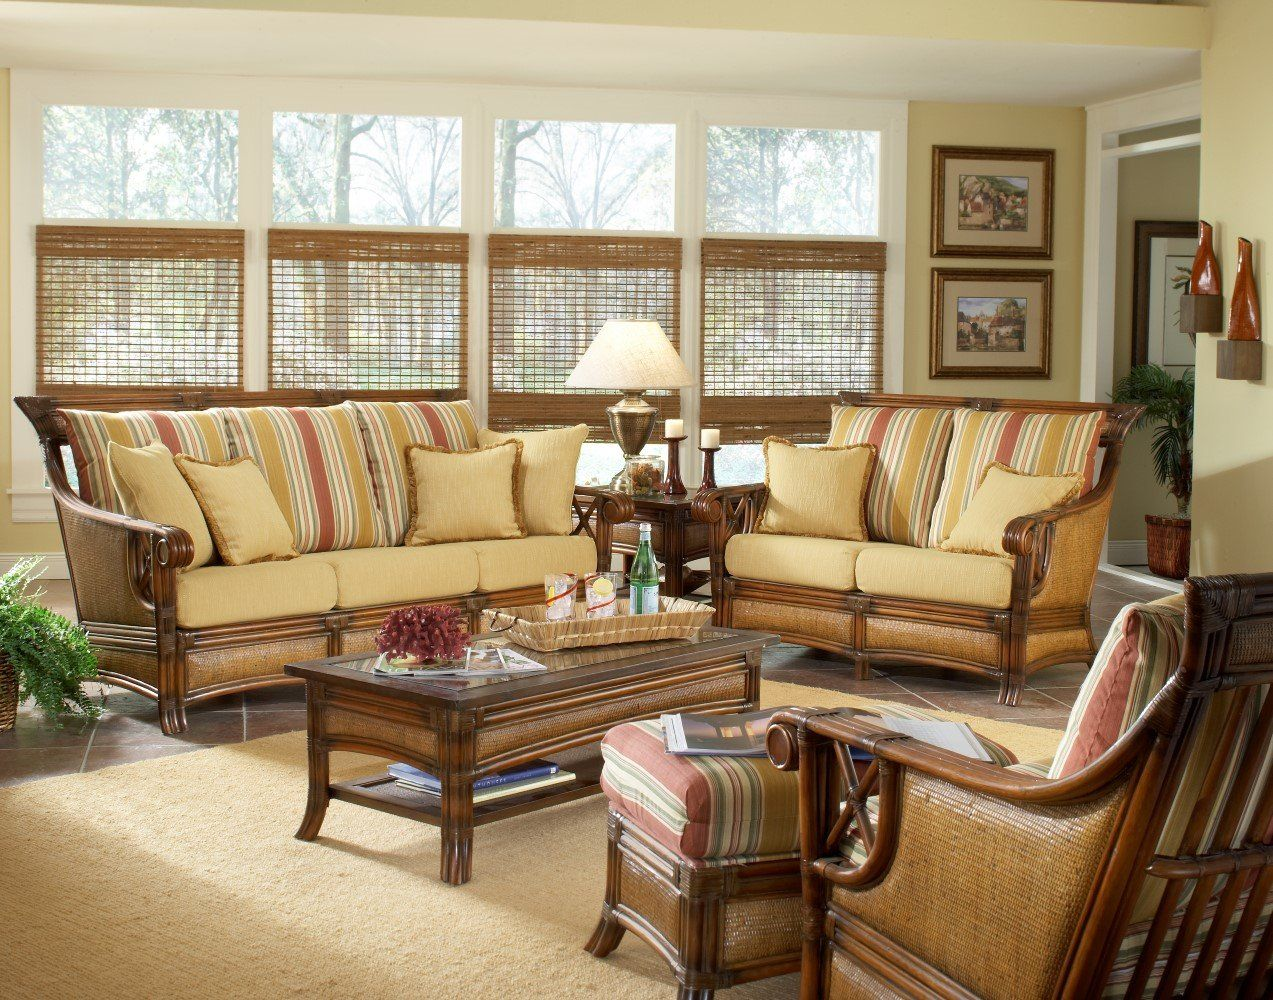 Sunroom Furniture Choose The Best Darbylanefurniture Com In